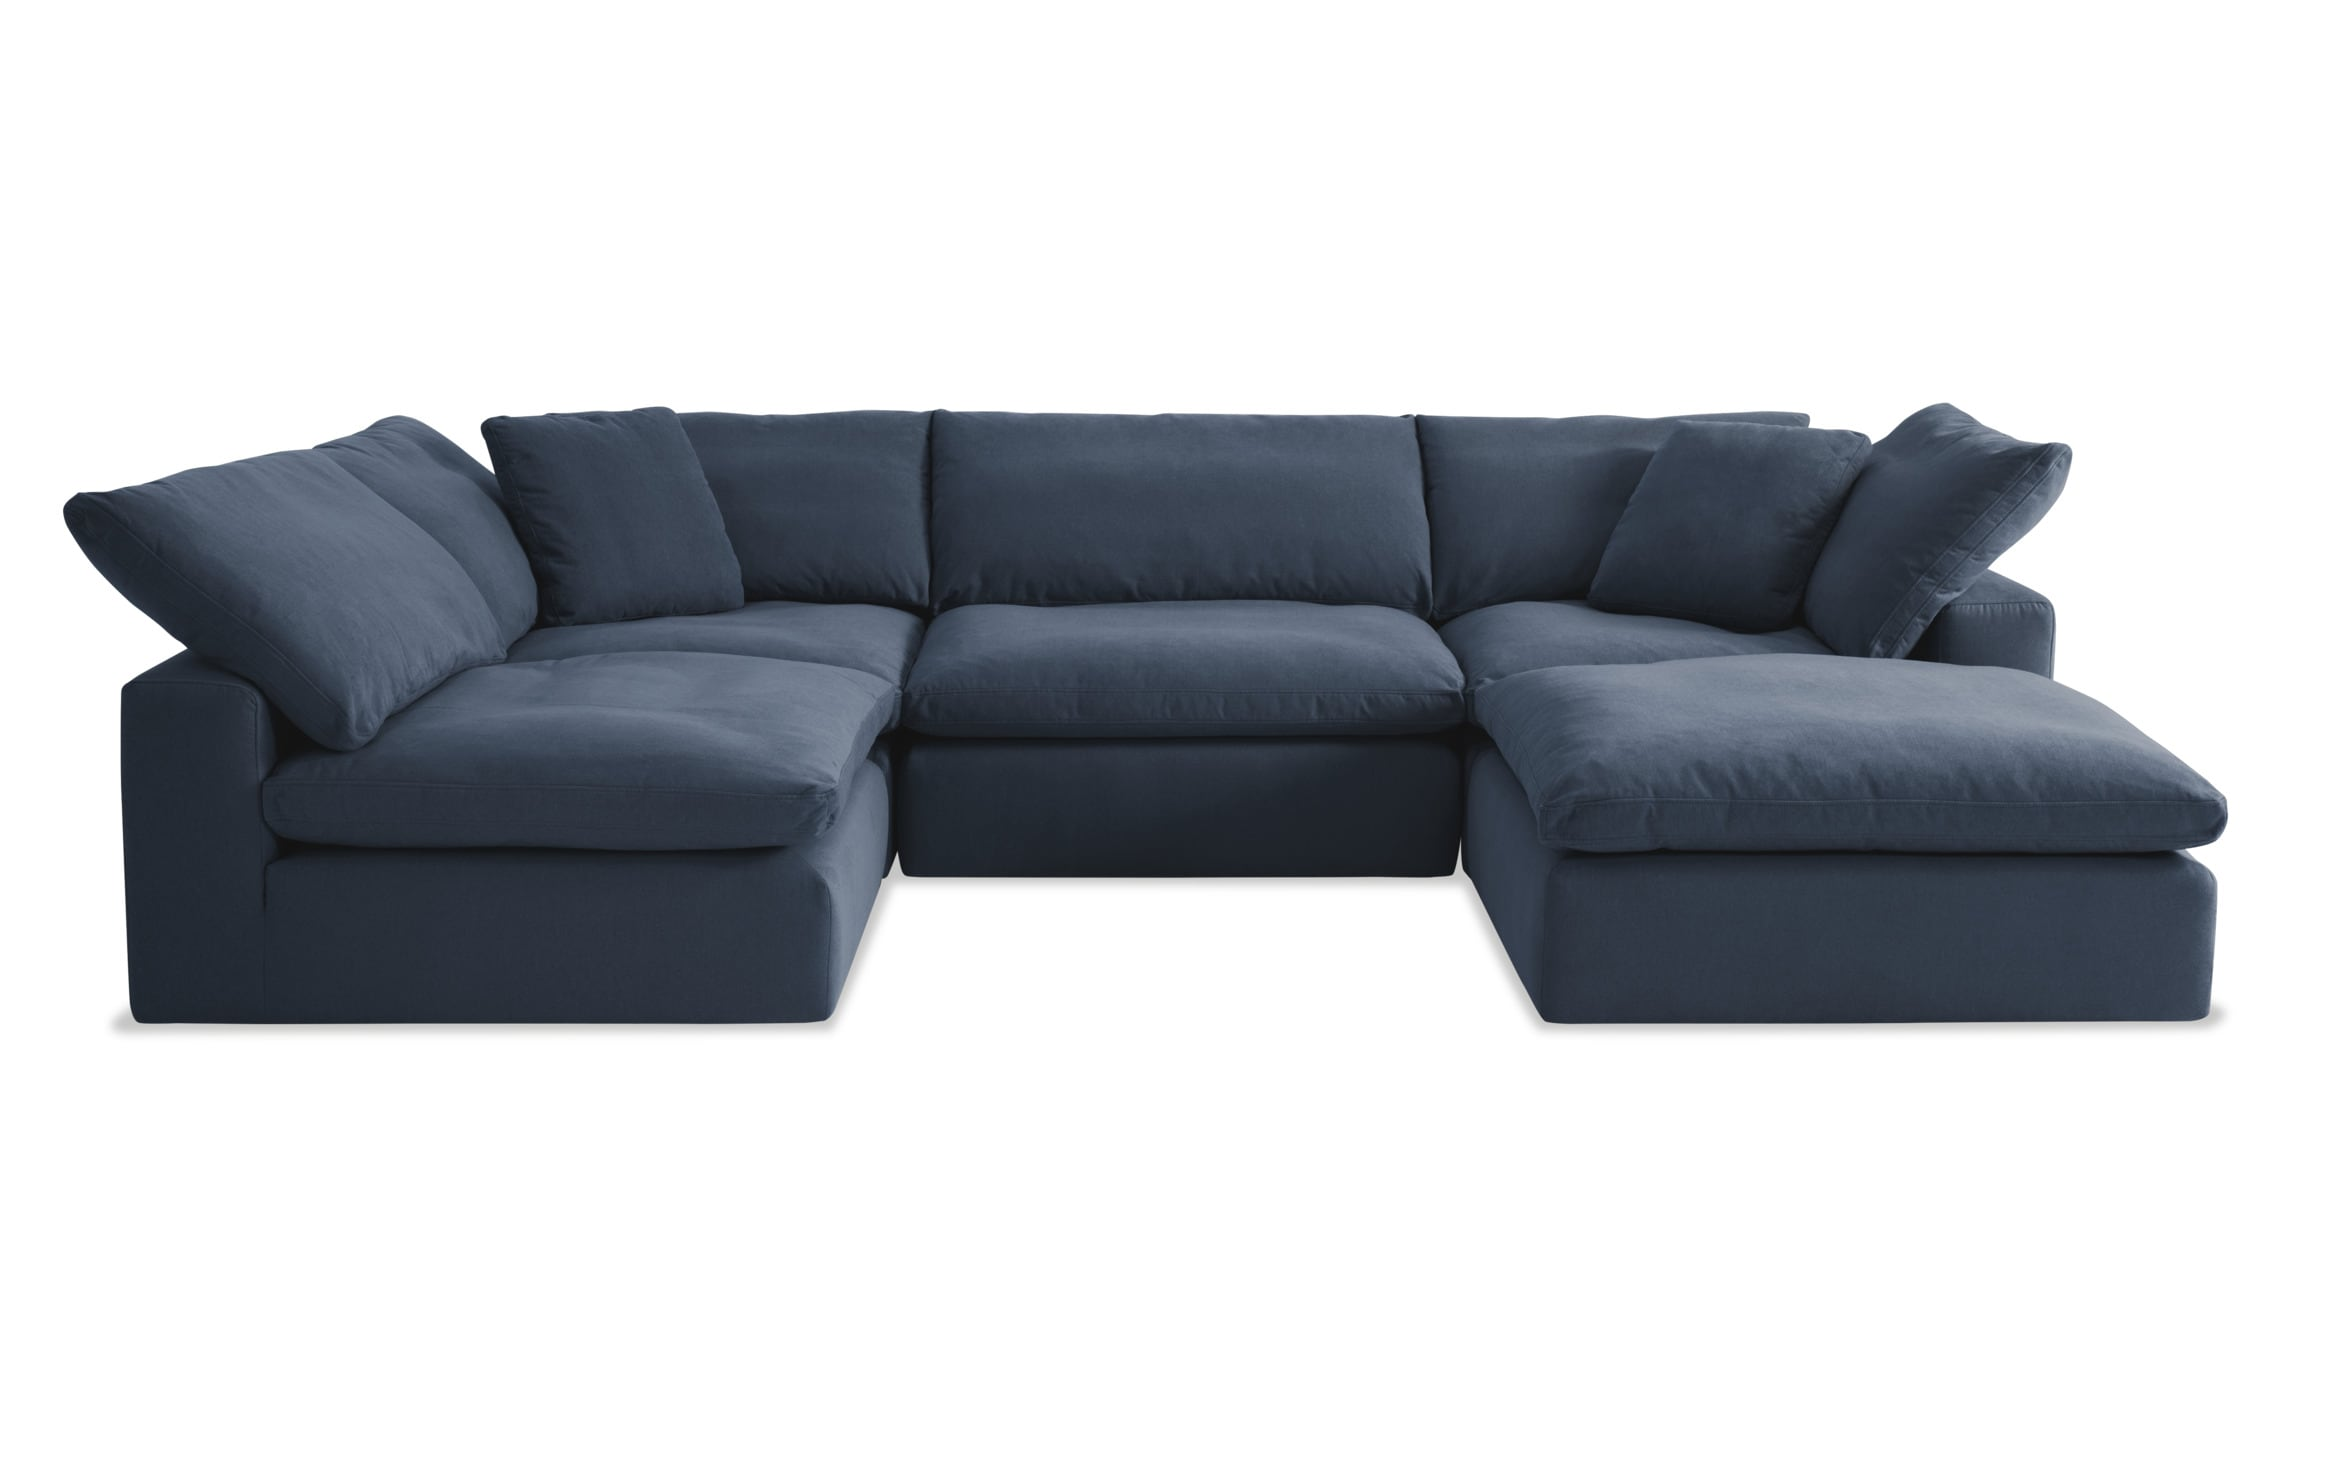 Dream Navy Modular 5 Piece Sectional | Bob's Discount Furniture